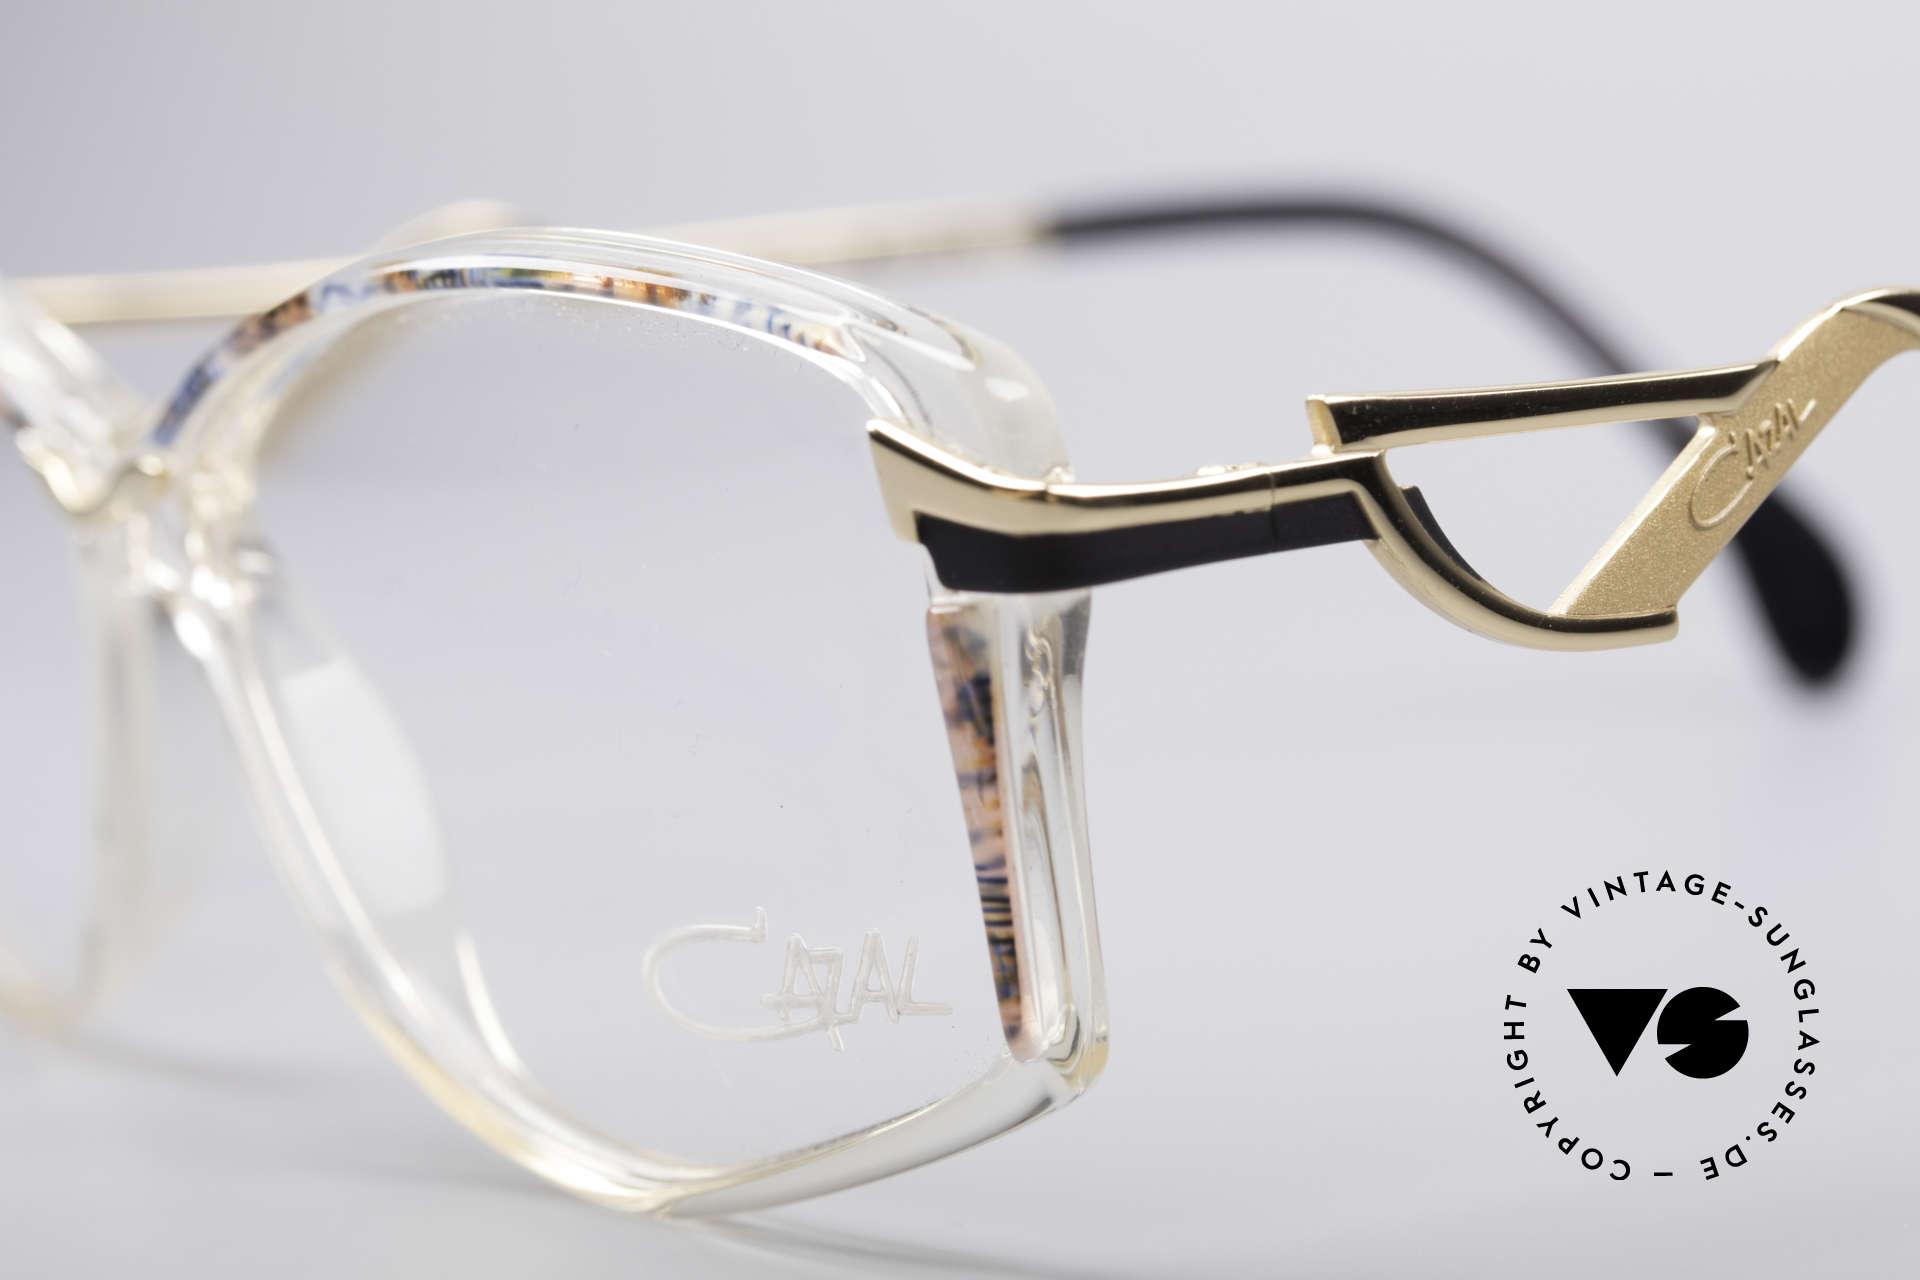 Cazal 369 90's Ladies Designer Glasses, Cazal color 825: crystal / pistachio mulitcolor / gold, Made for Women